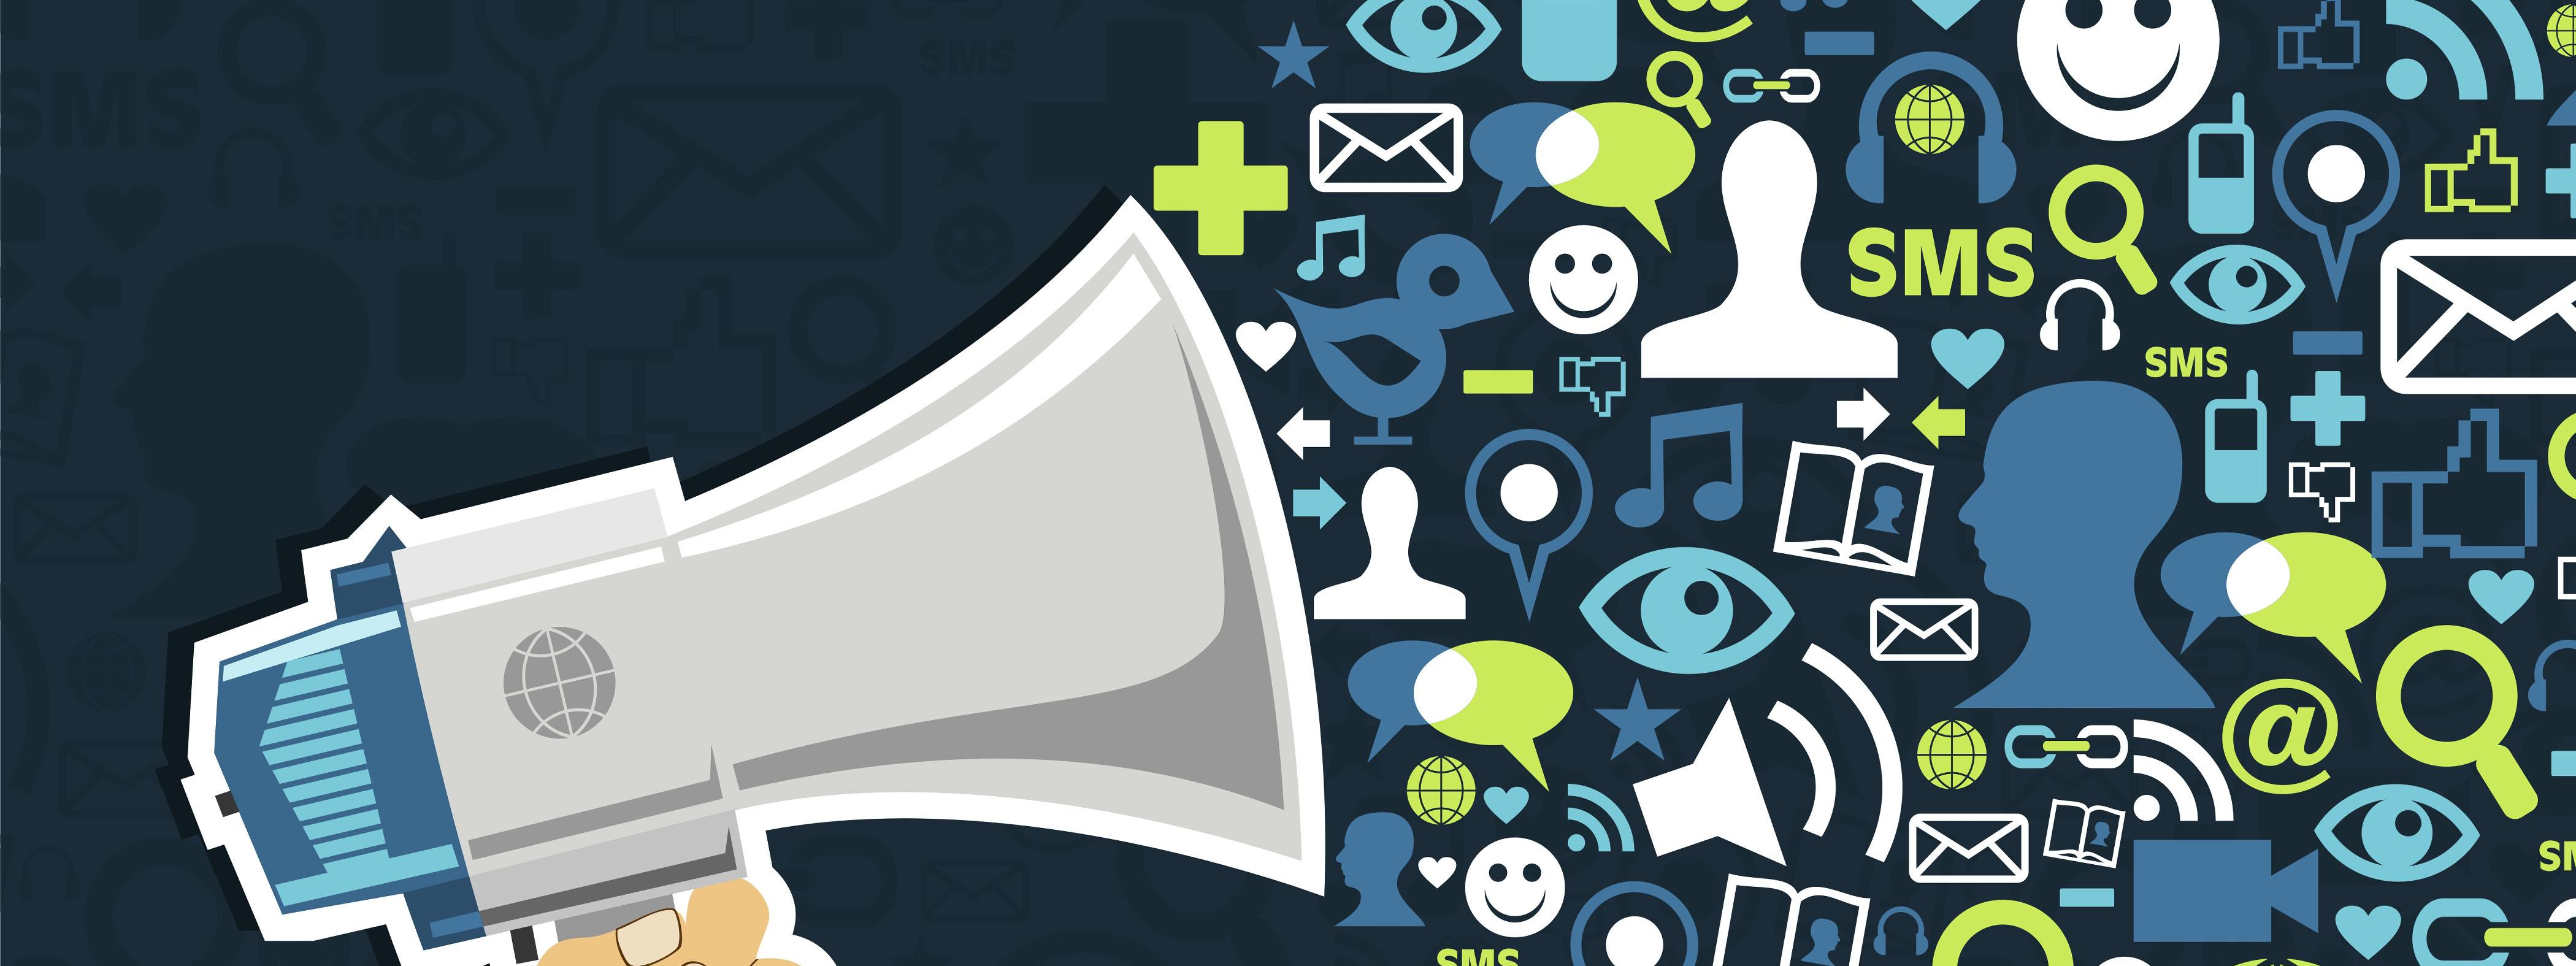 social media megaphone